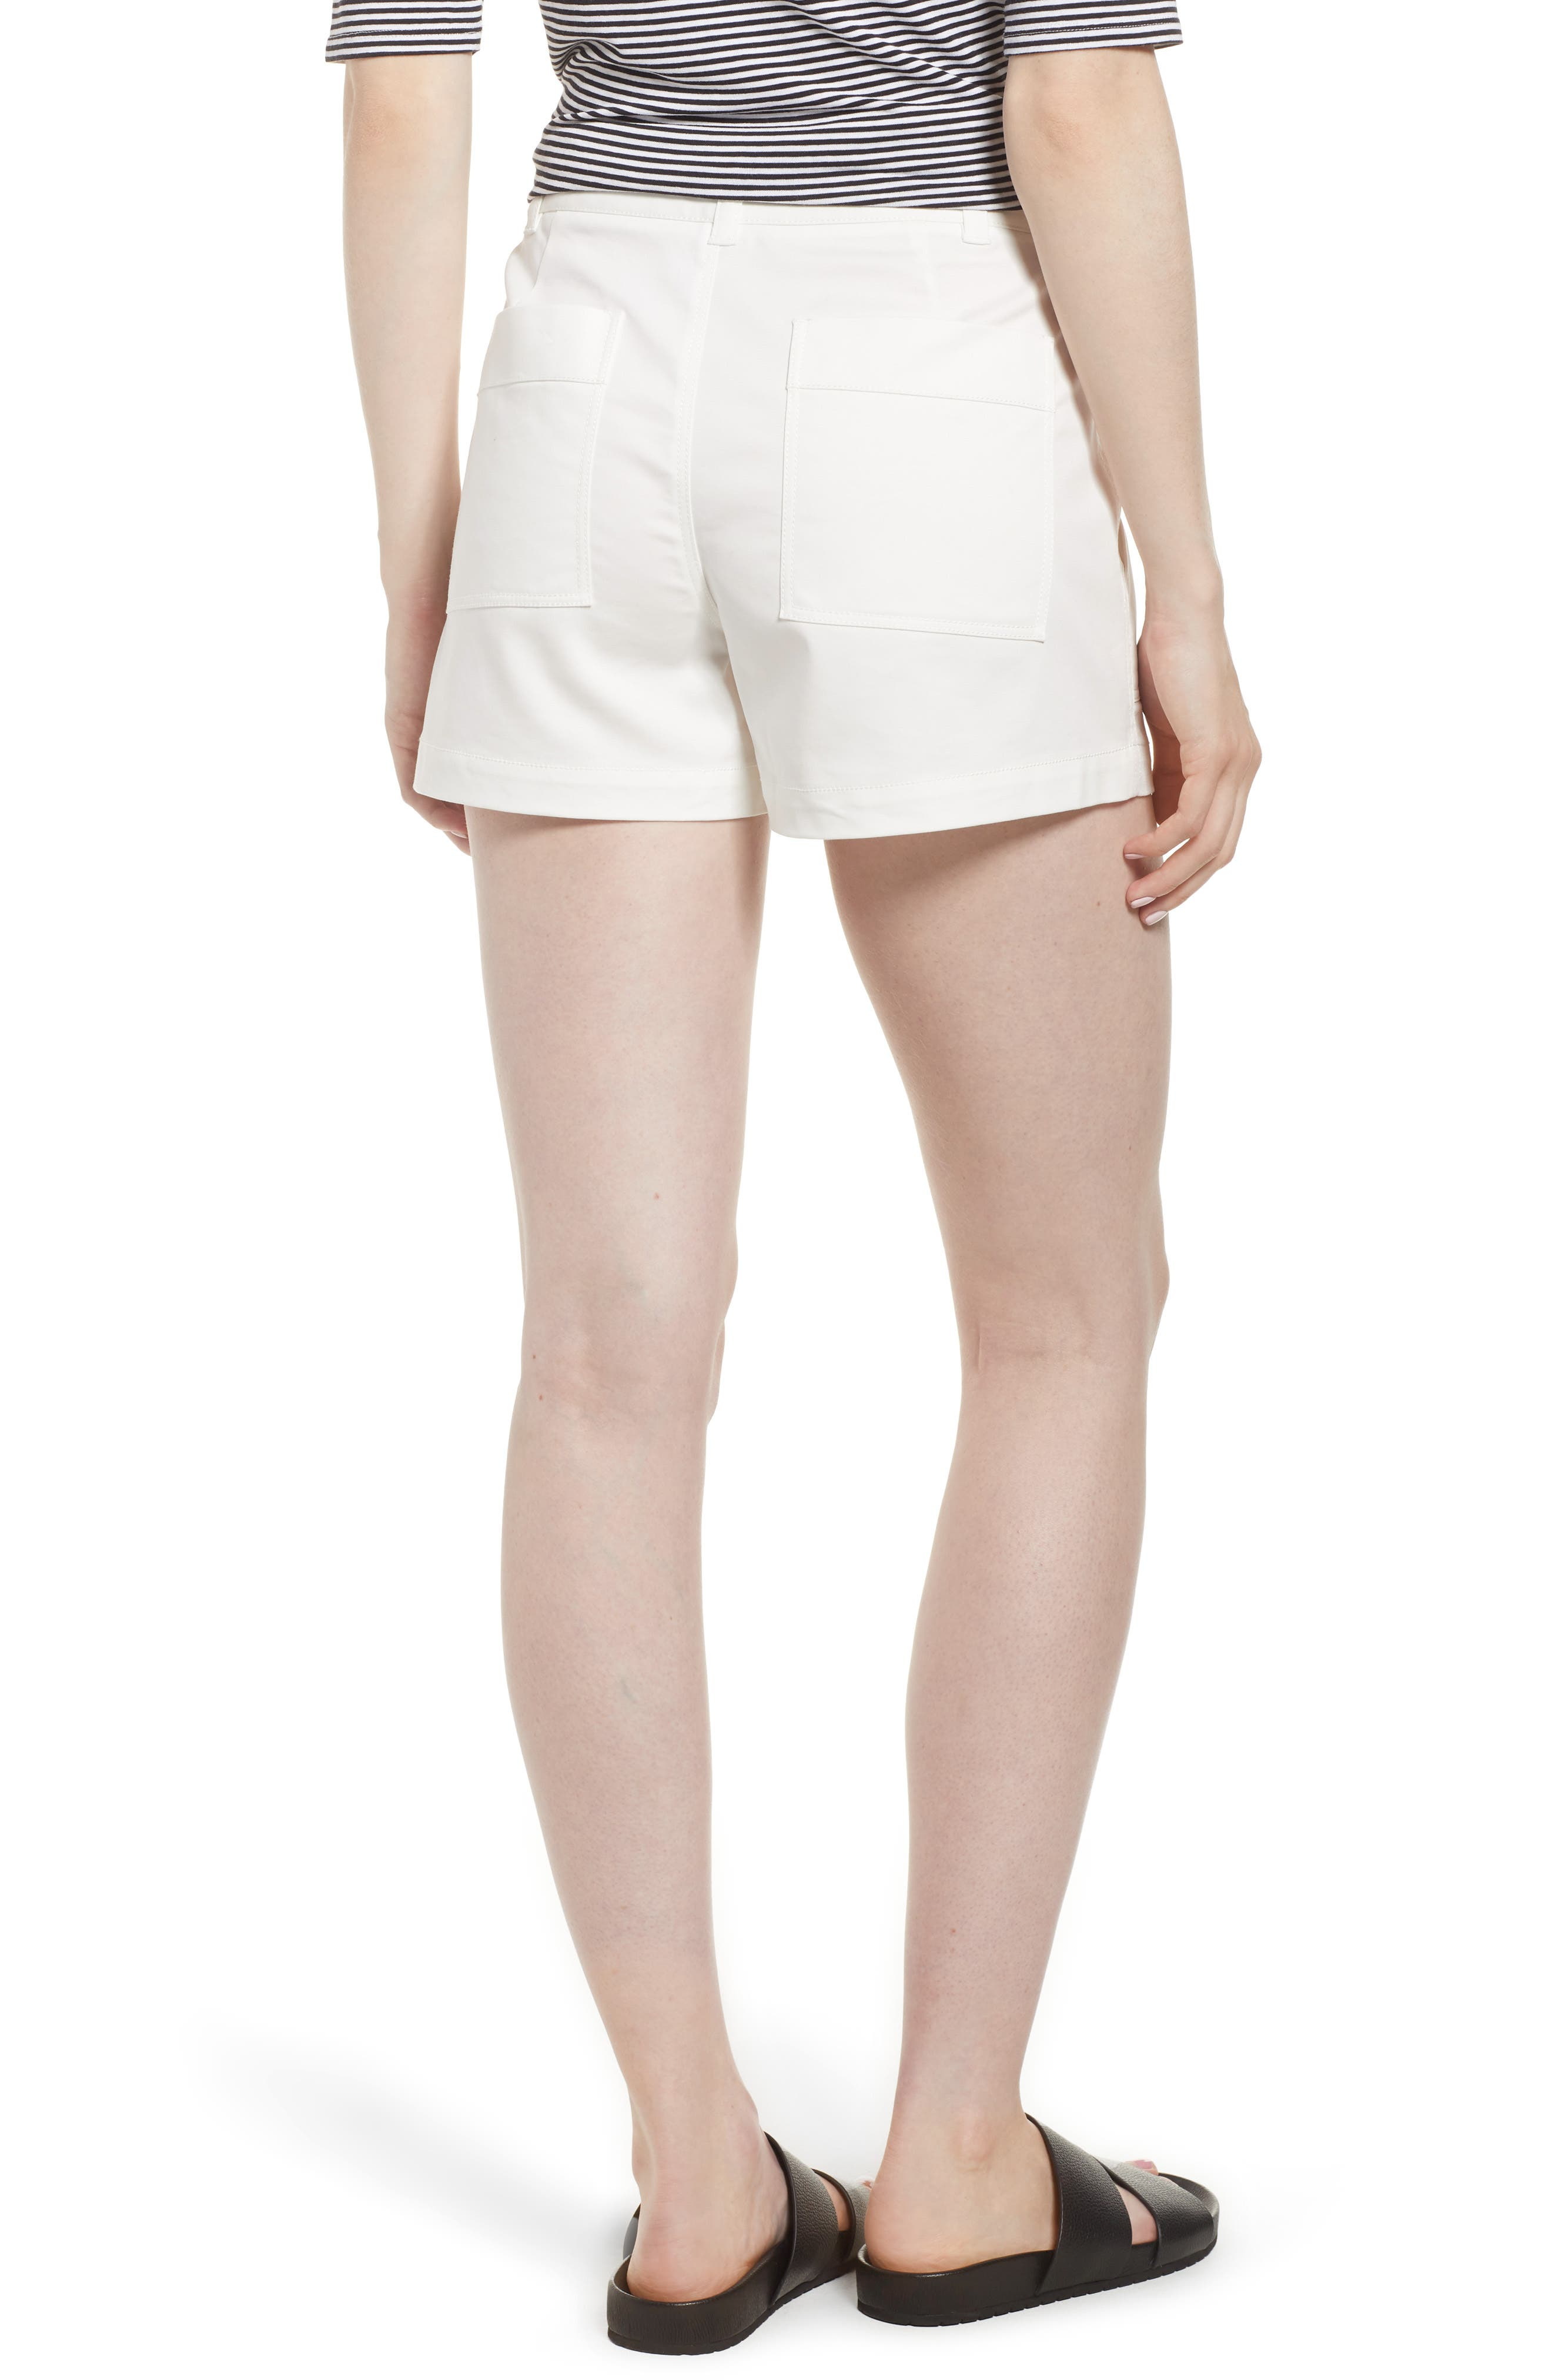 Patch Pocket Shorts,                             Alternate thumbnail 2, color,                             White